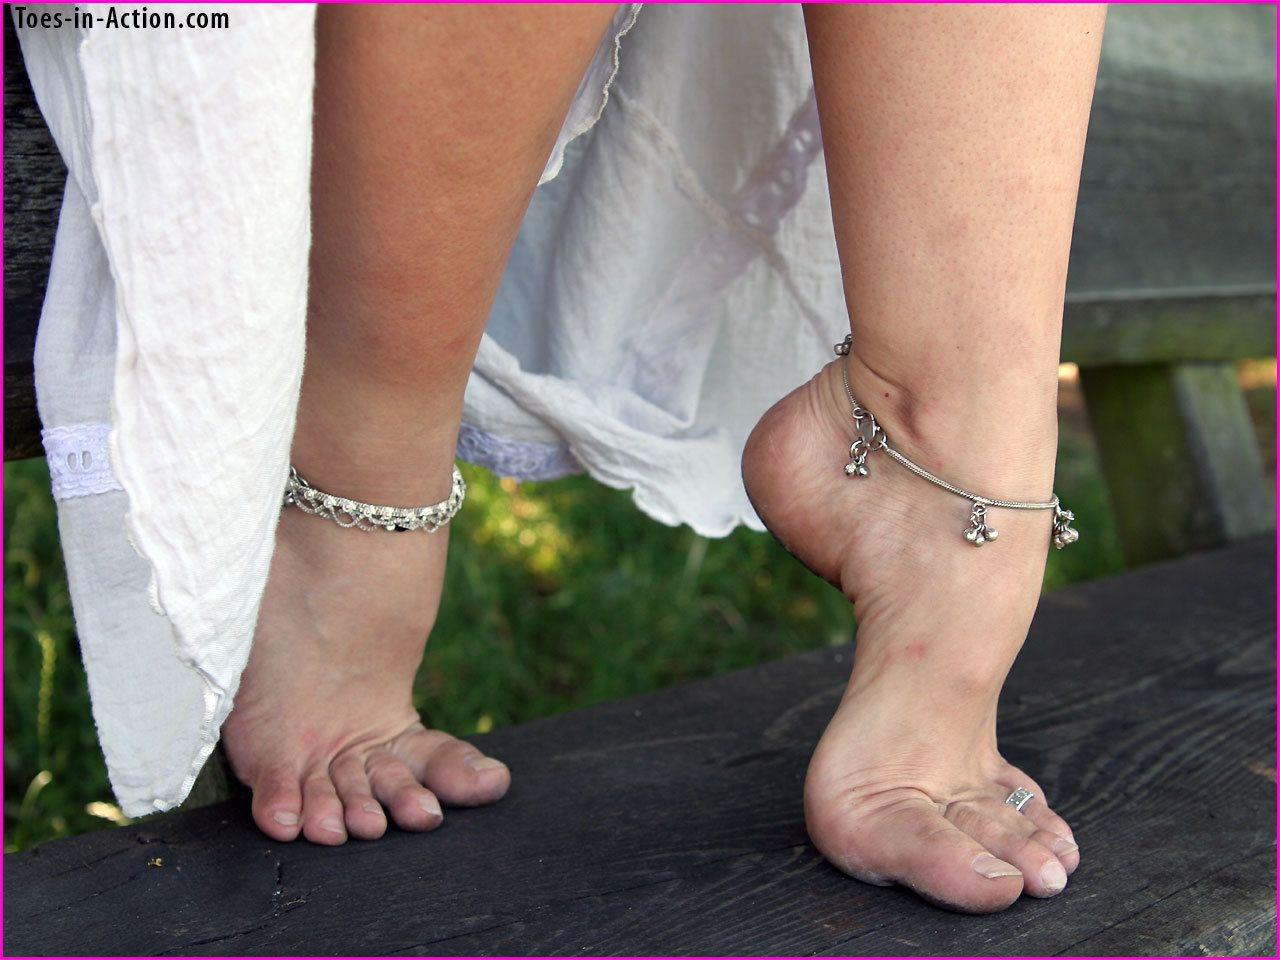 Arab women seex